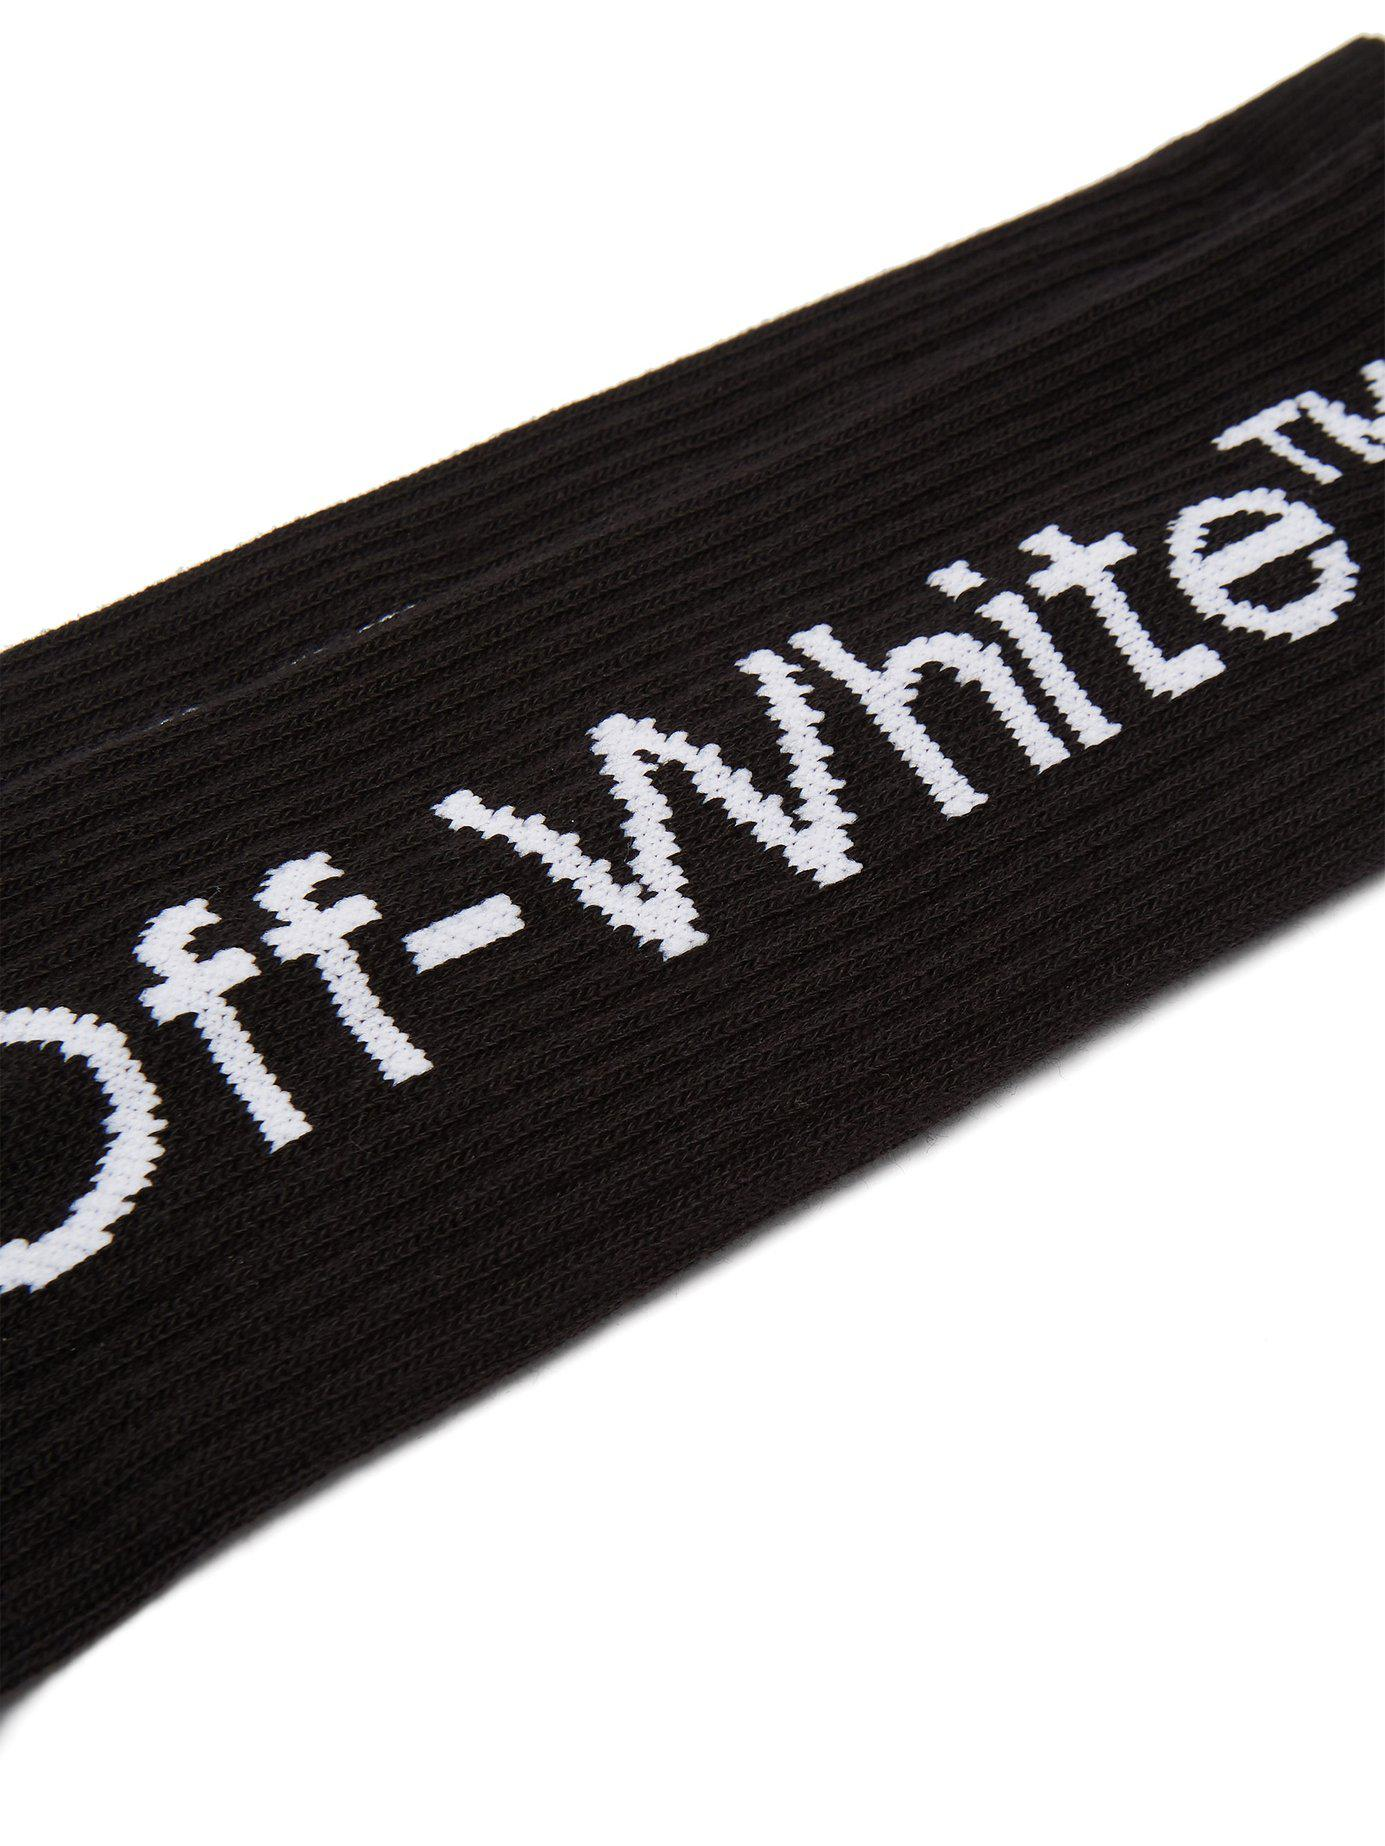 ff68914f58ec Lyst - Off-White c o Virgil Abloh Arrow Cotton Blend Socks in Black for Men  - Save 30%